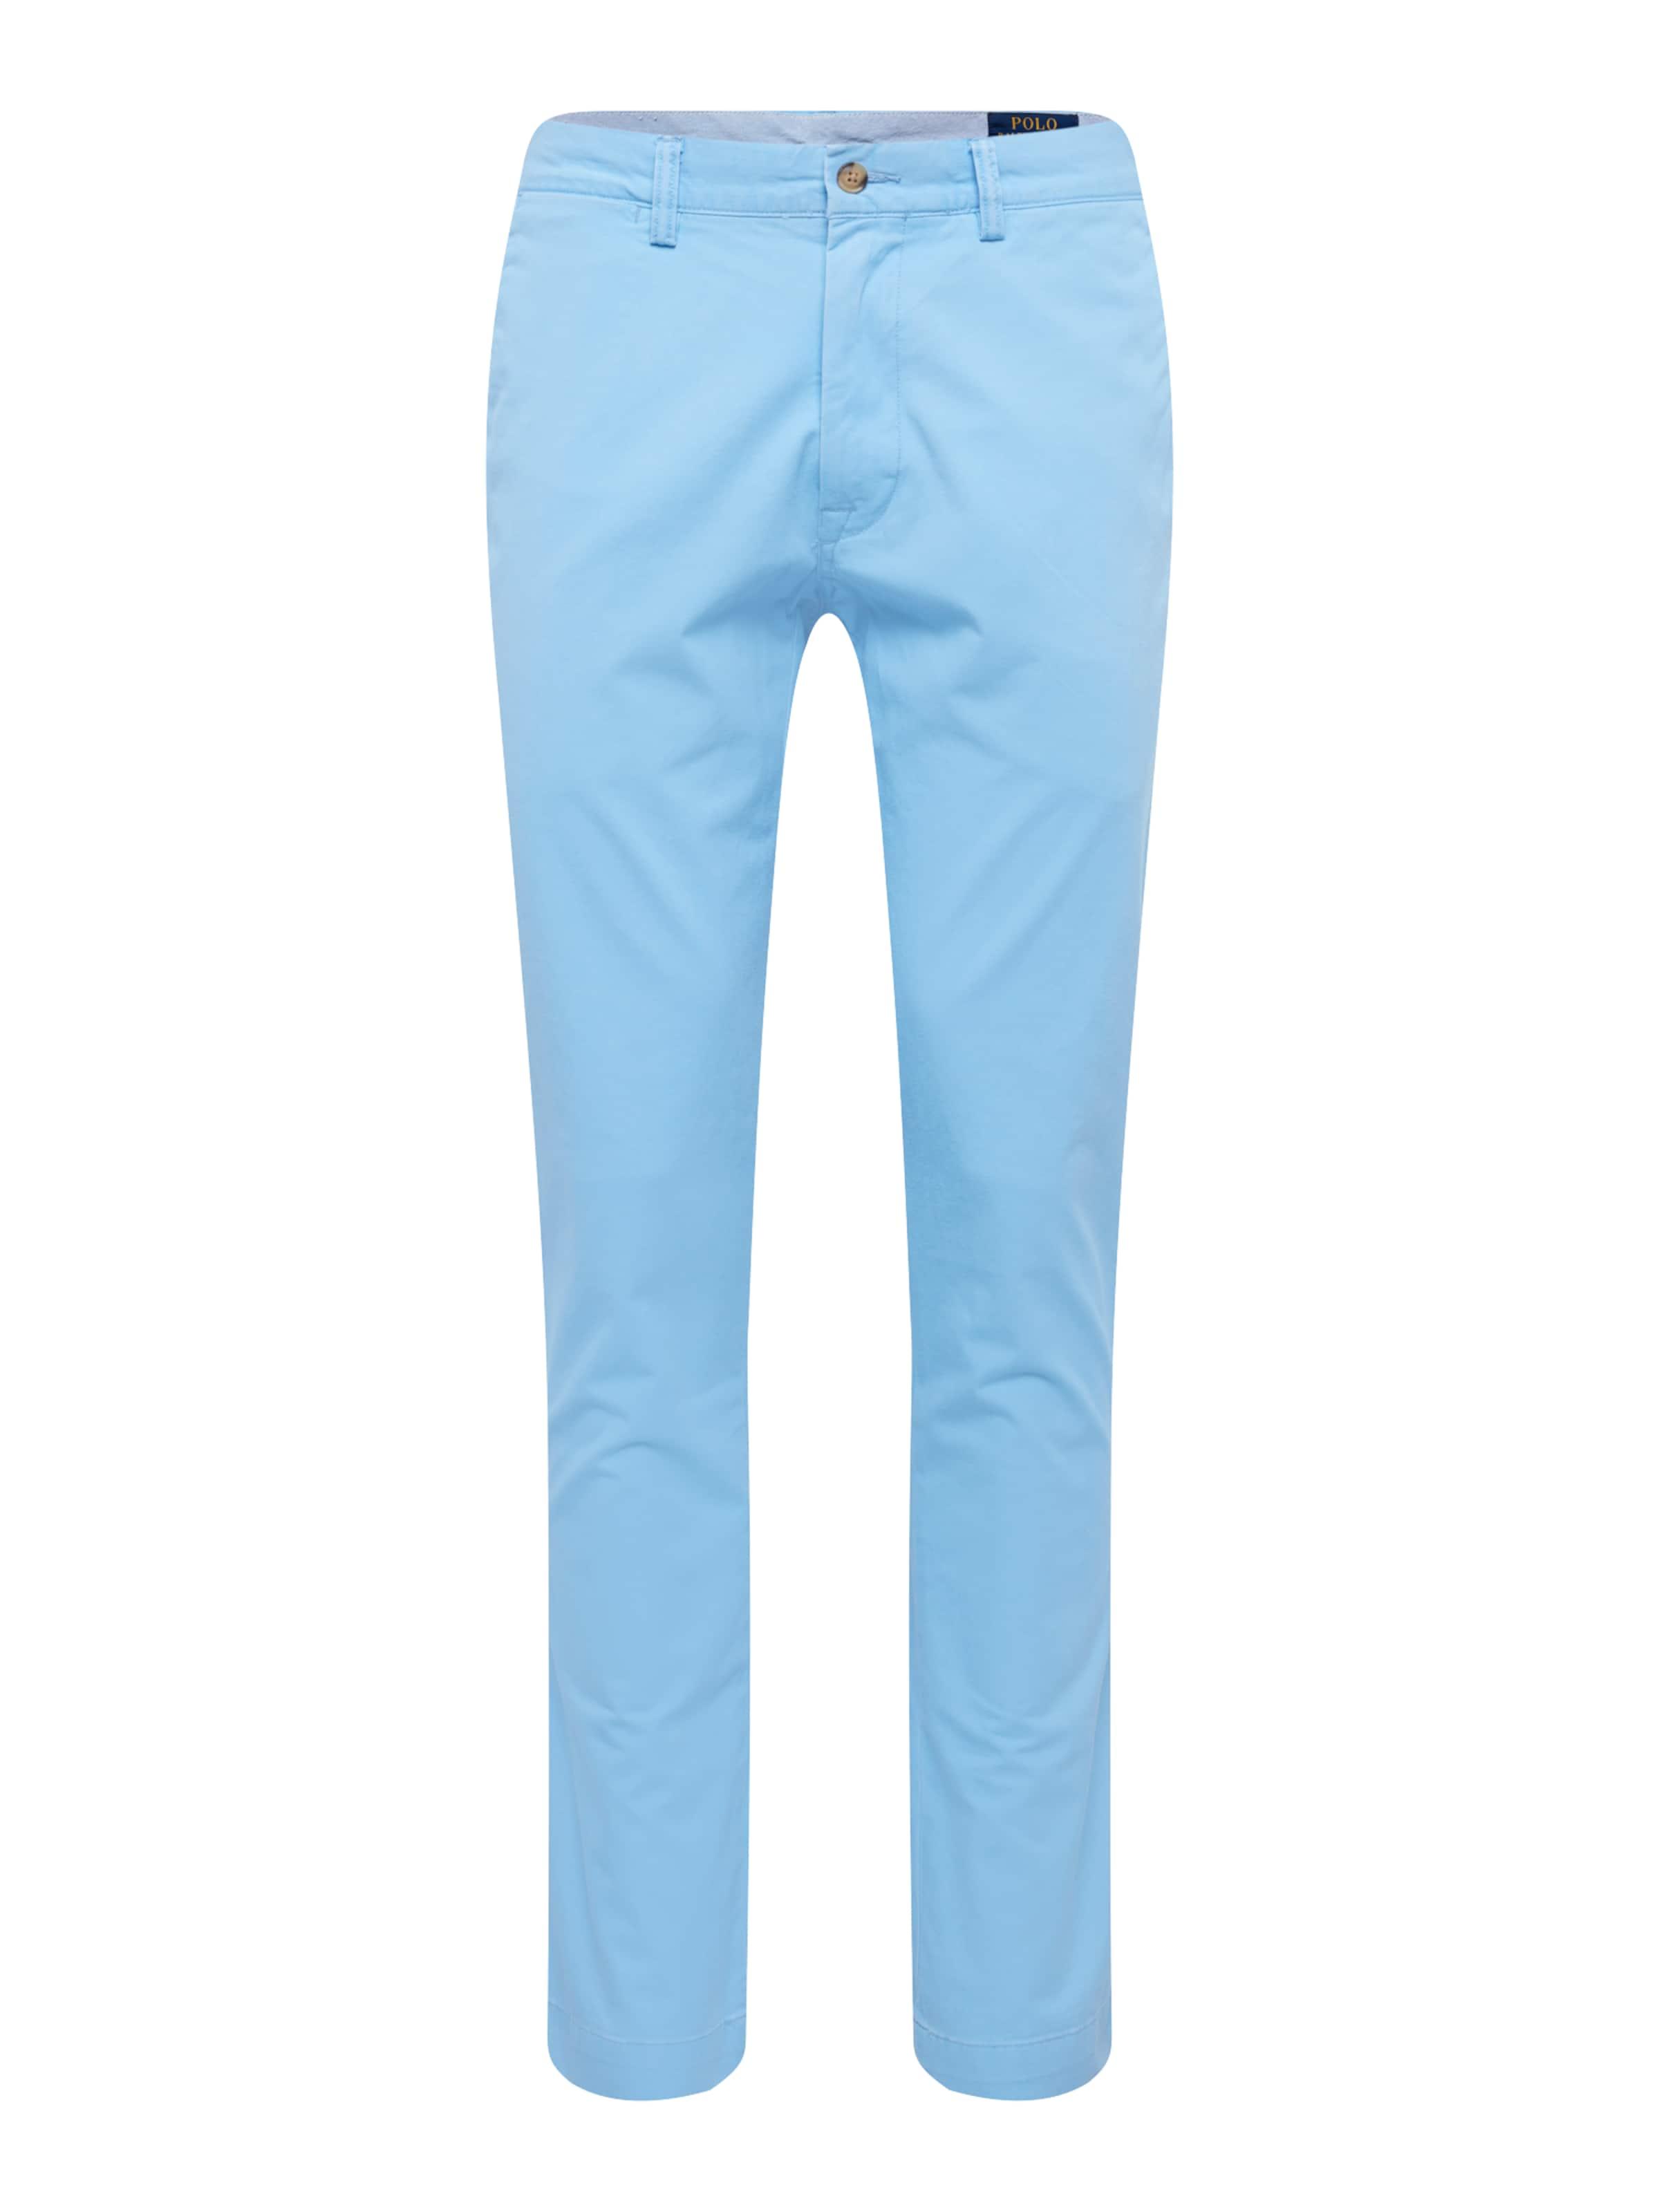 En Pantalon Clair Bleu Lauren Ralph Polo 'bedford' Chino NOP8wnkZX0